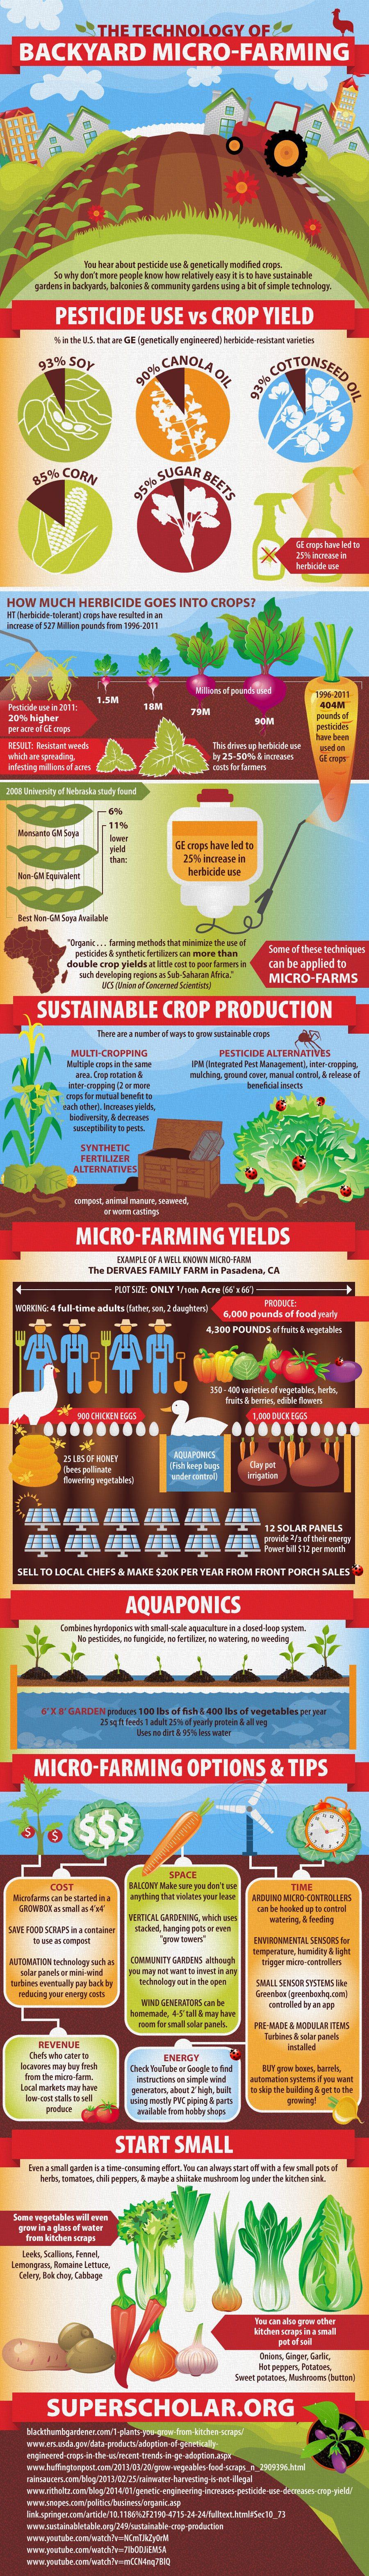 Backyard Micro-Farming